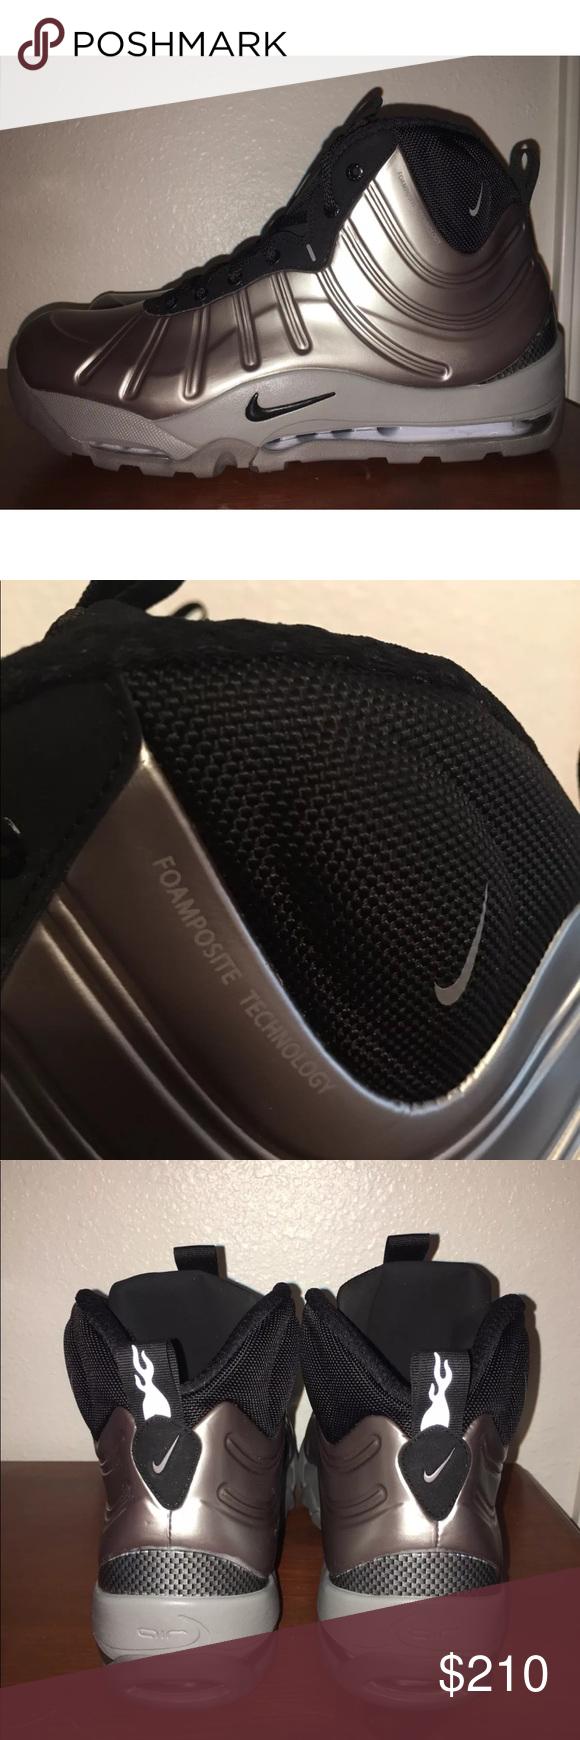 Nike Air Boot Pewter Posite New Brand Metallic Size 11 Bakin twwrdF